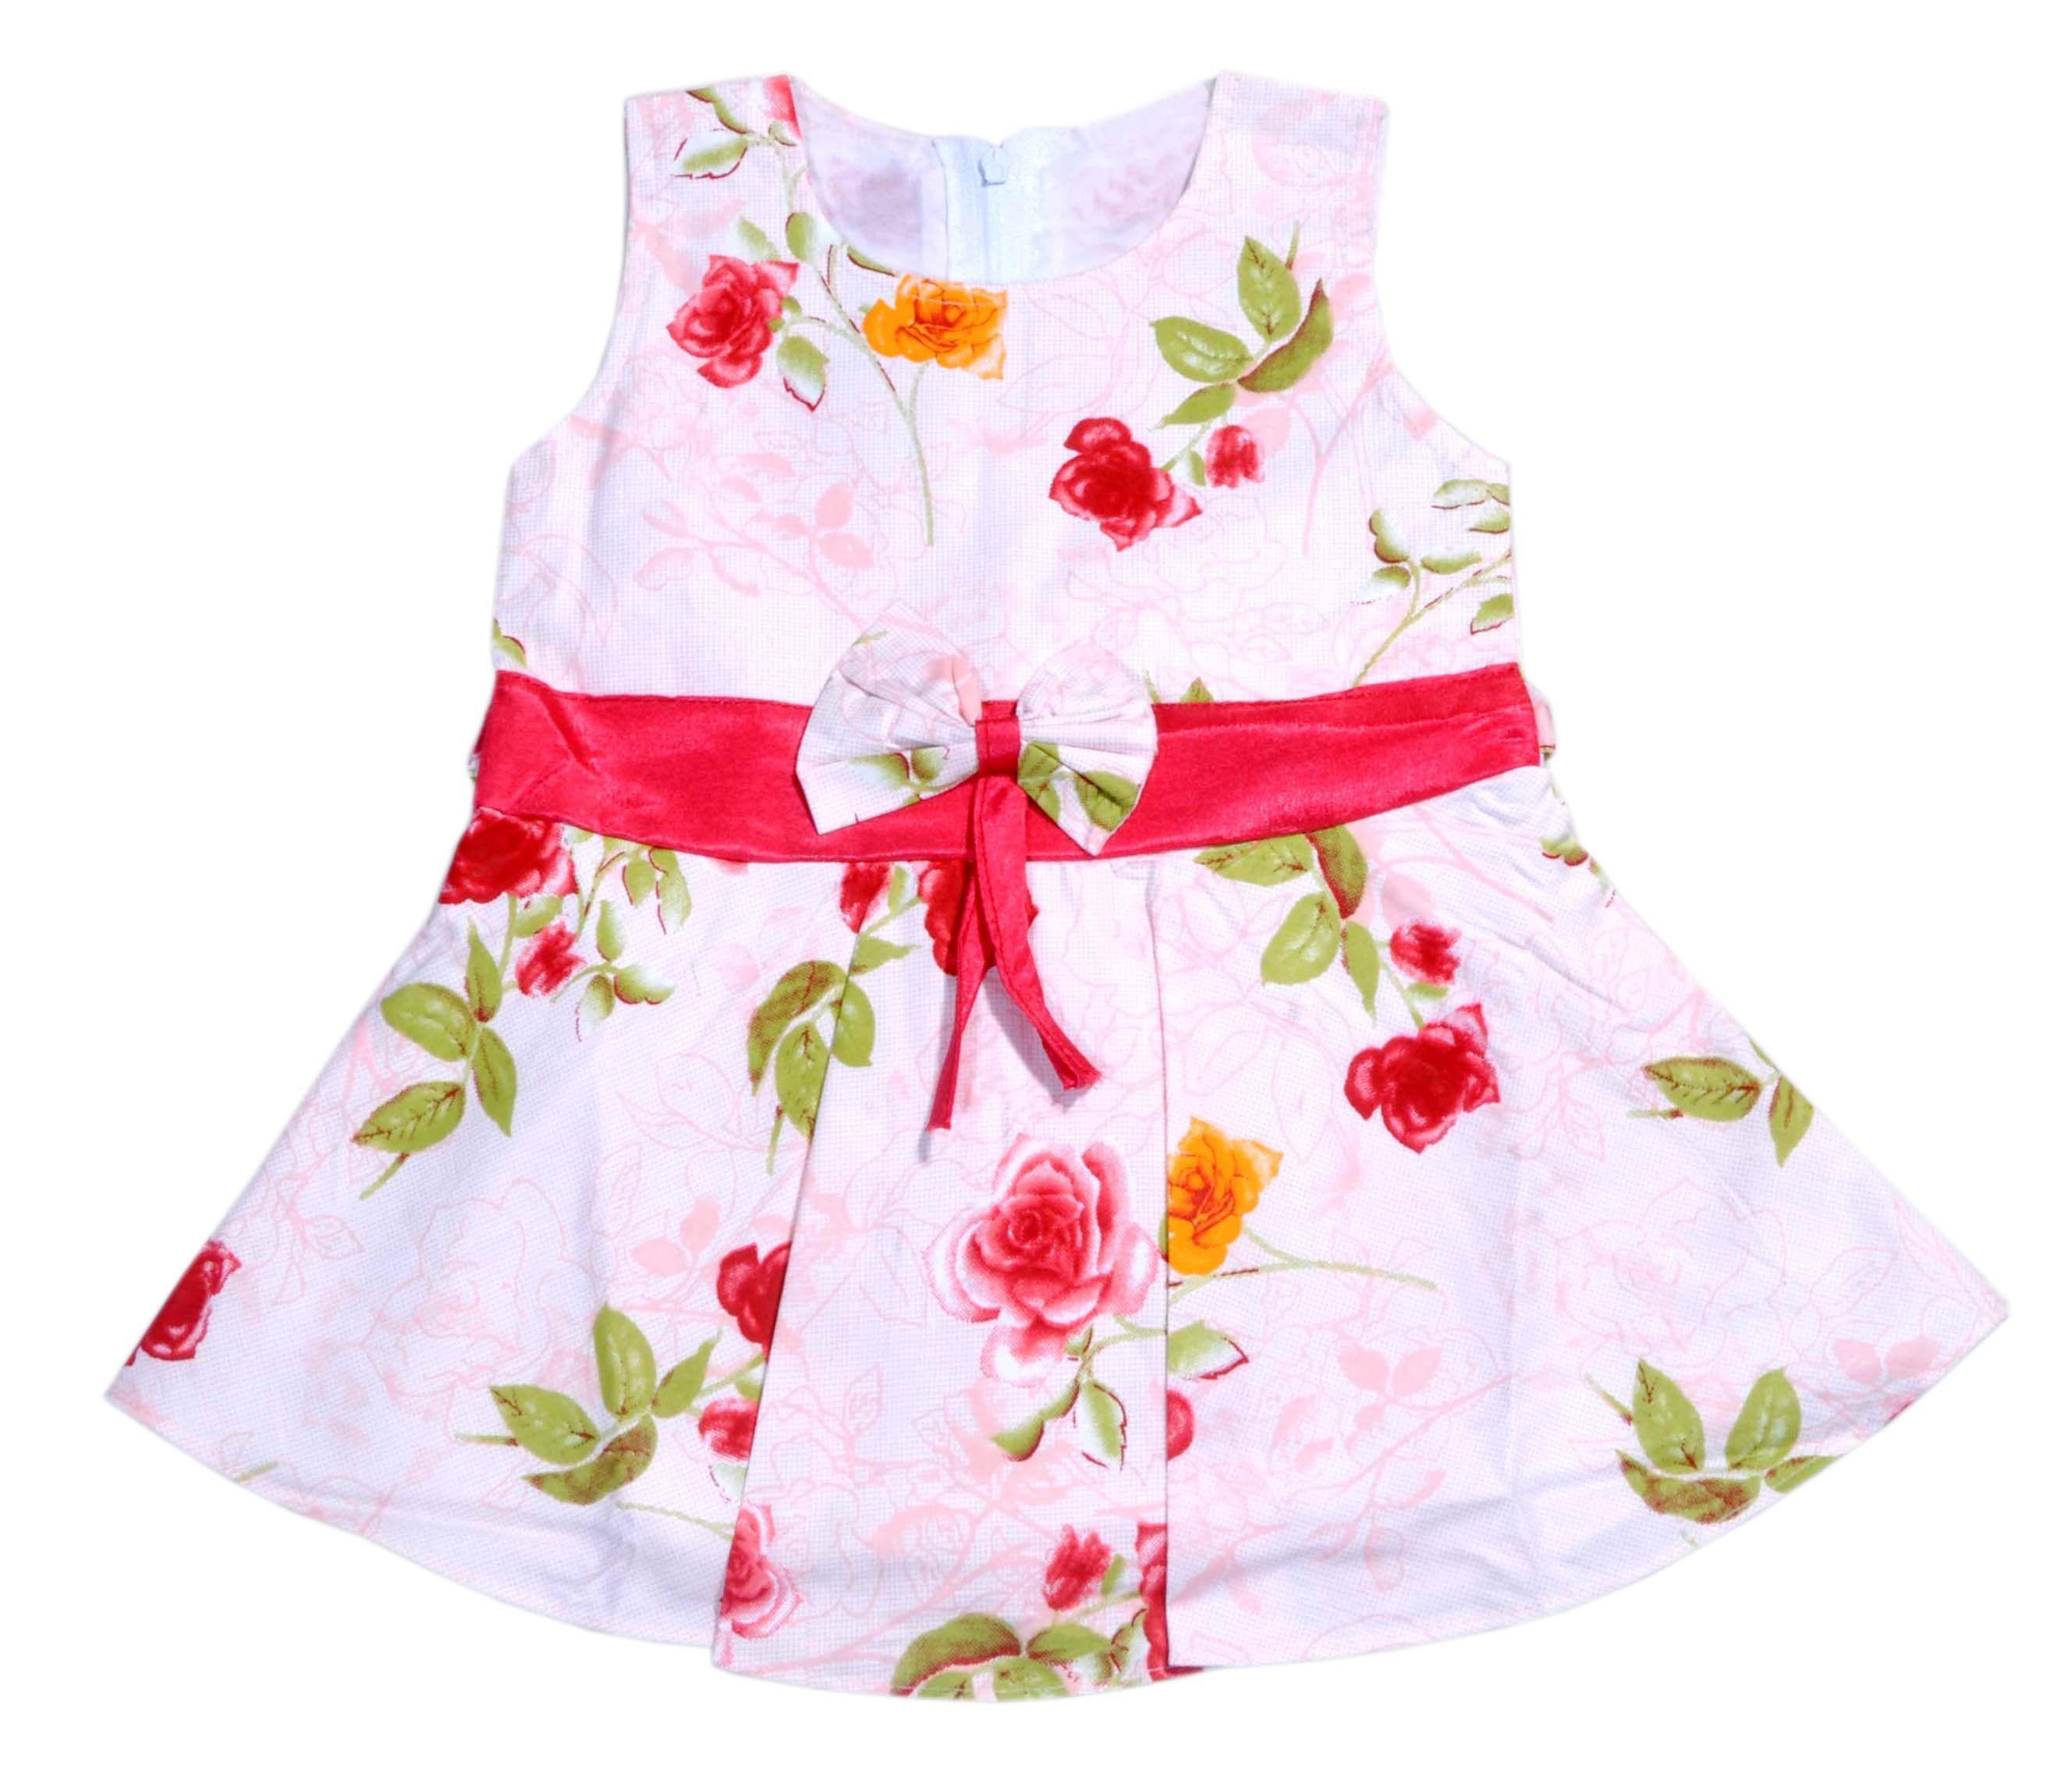 3125e351f4ef69 HEY BABY SUMMER SPECIAL PARTYWEAR FROCK FOR BABY GIRLS - Buy HEY BABY  SUMMER SPECIAL PARTYWEAR FROCK FOR BABY GIRLS Online at Low Price - Snapdeal